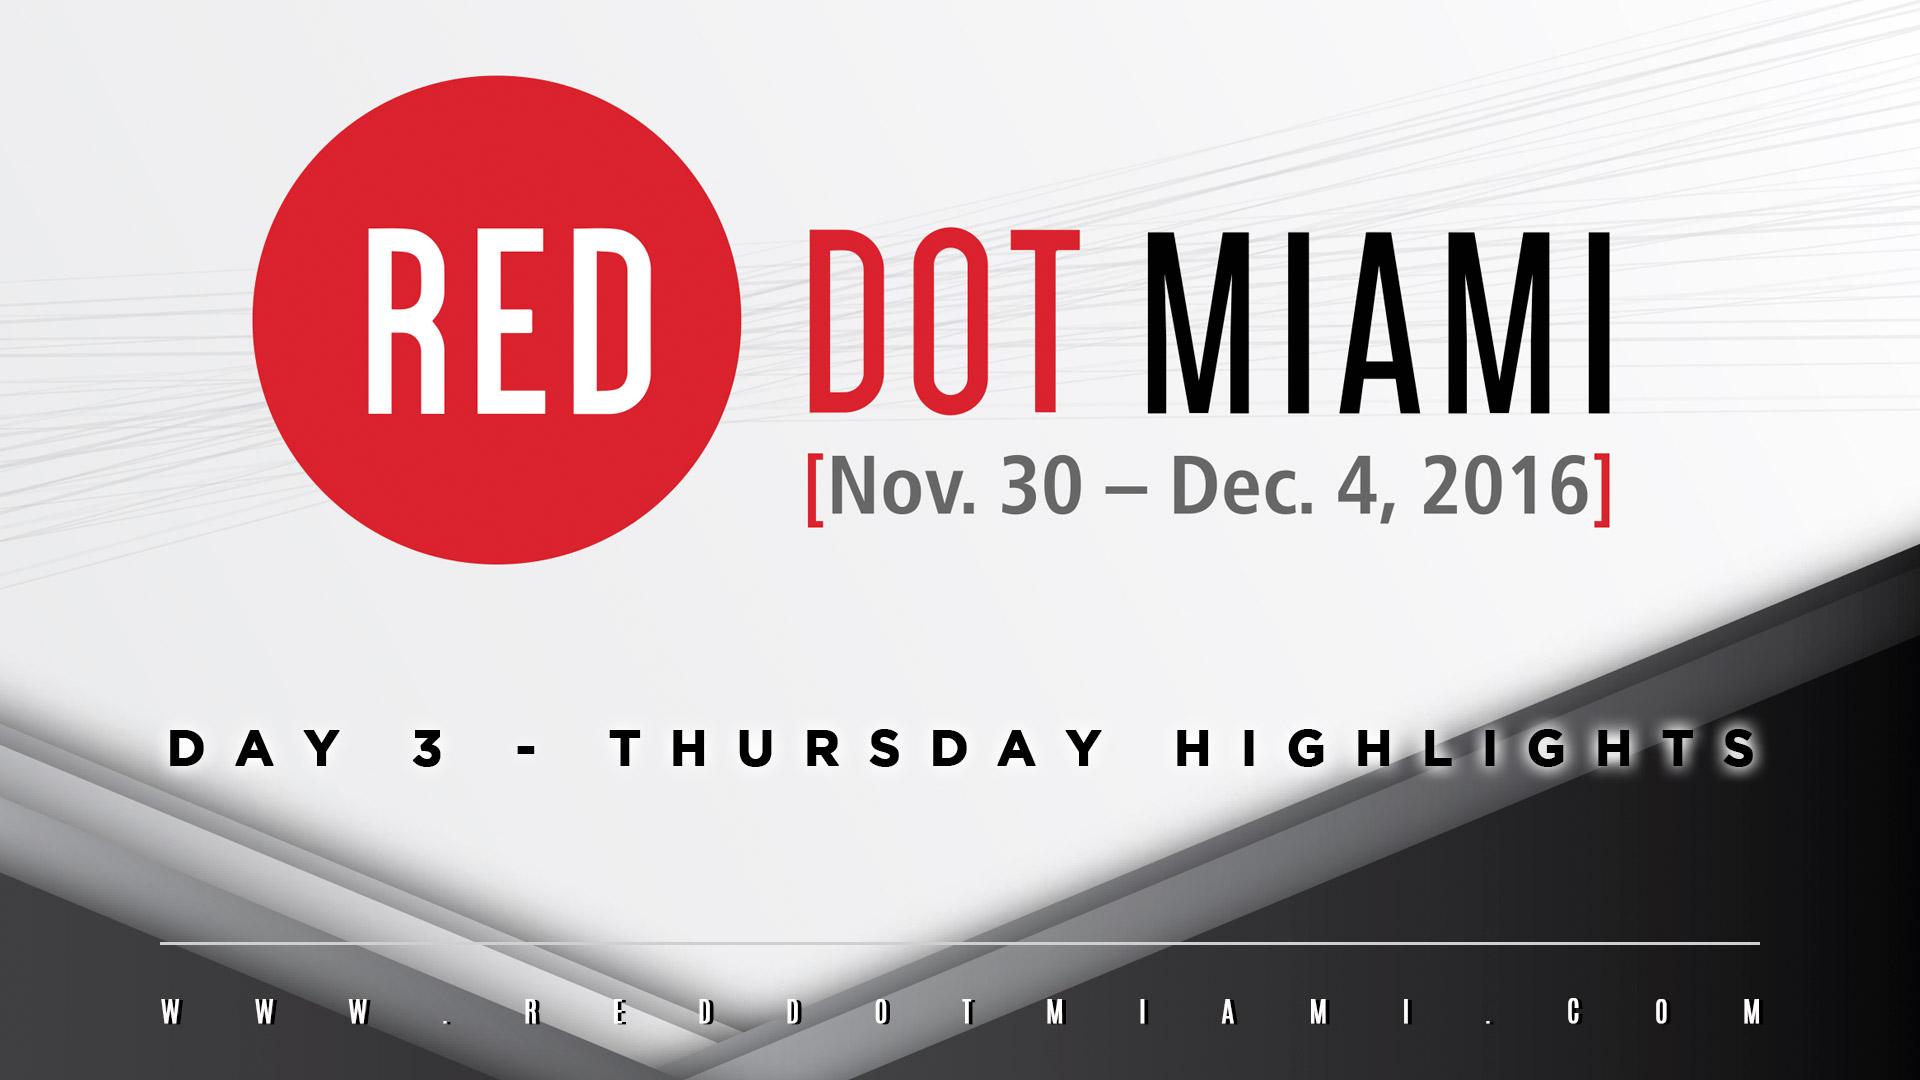 Red Dot Miami 2016 - Thursday Highlights